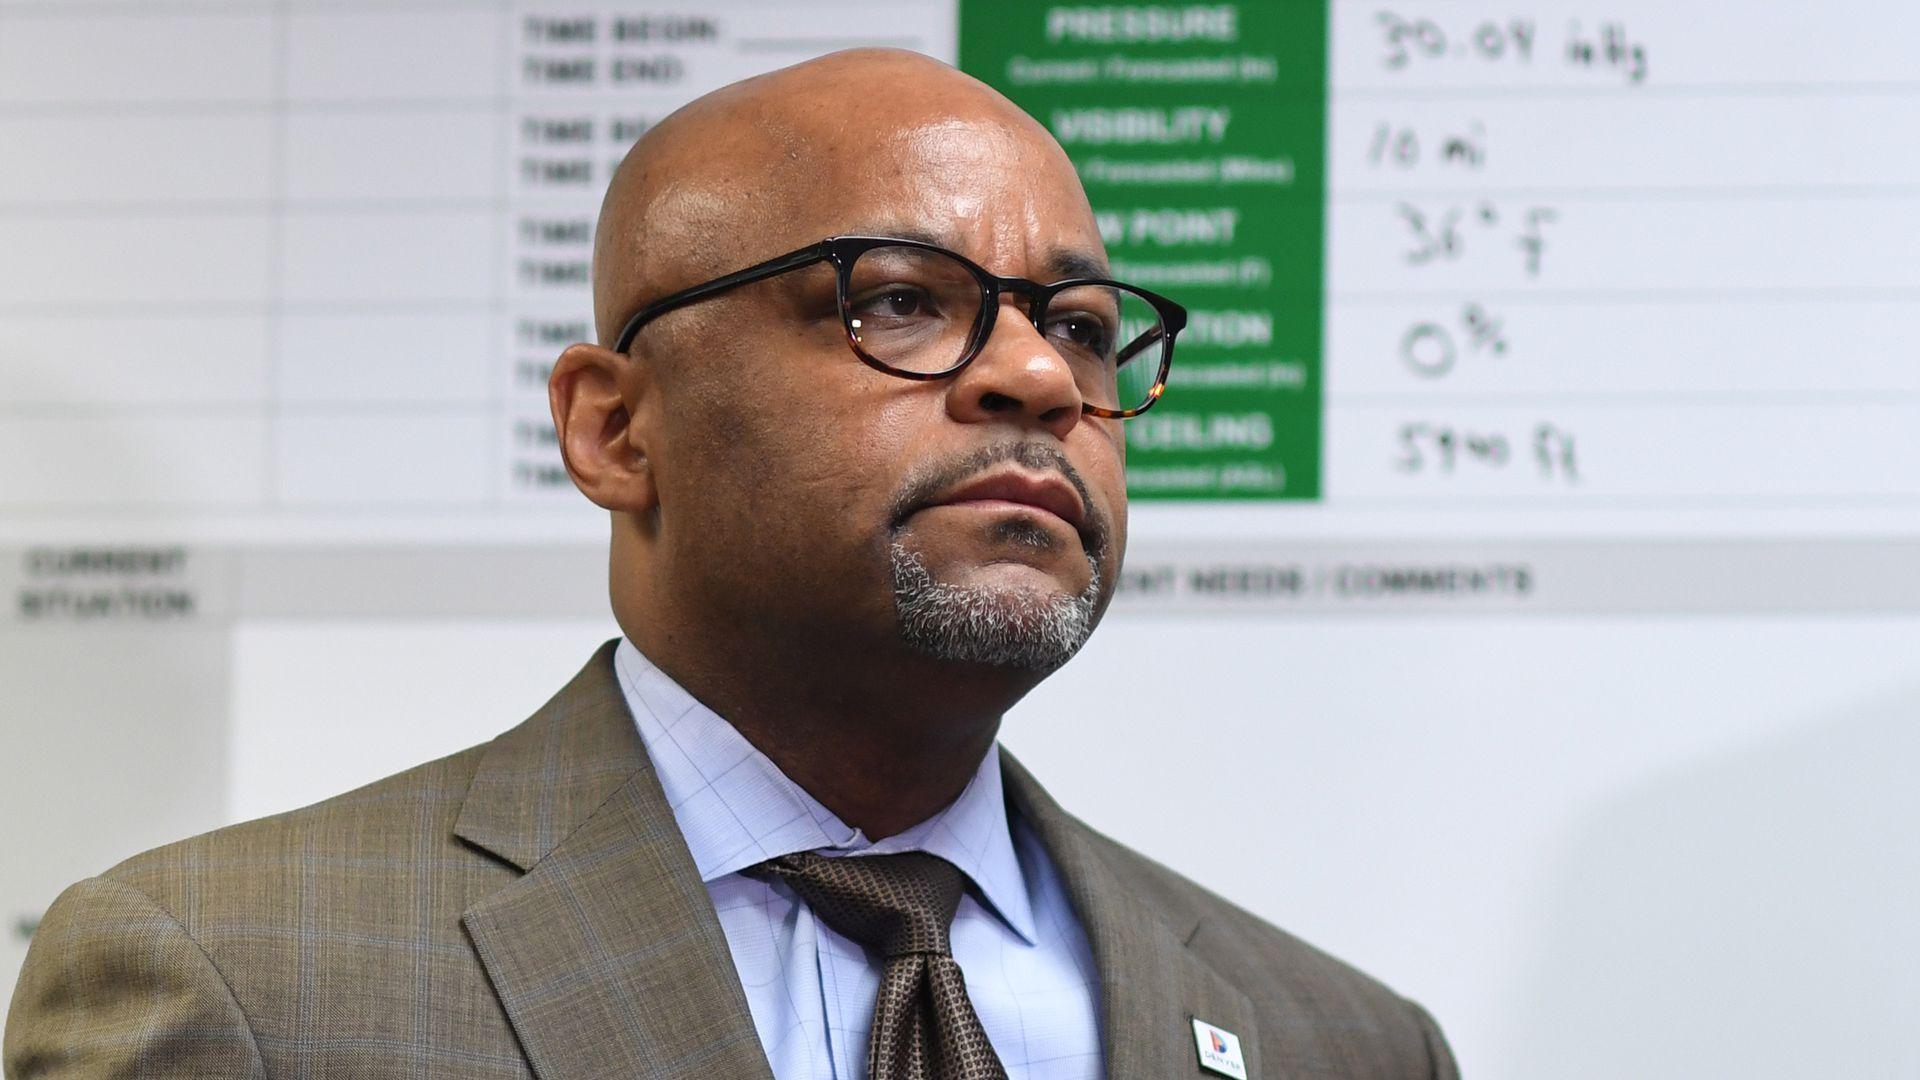 A photo of Denver Mayor Michael Hancock